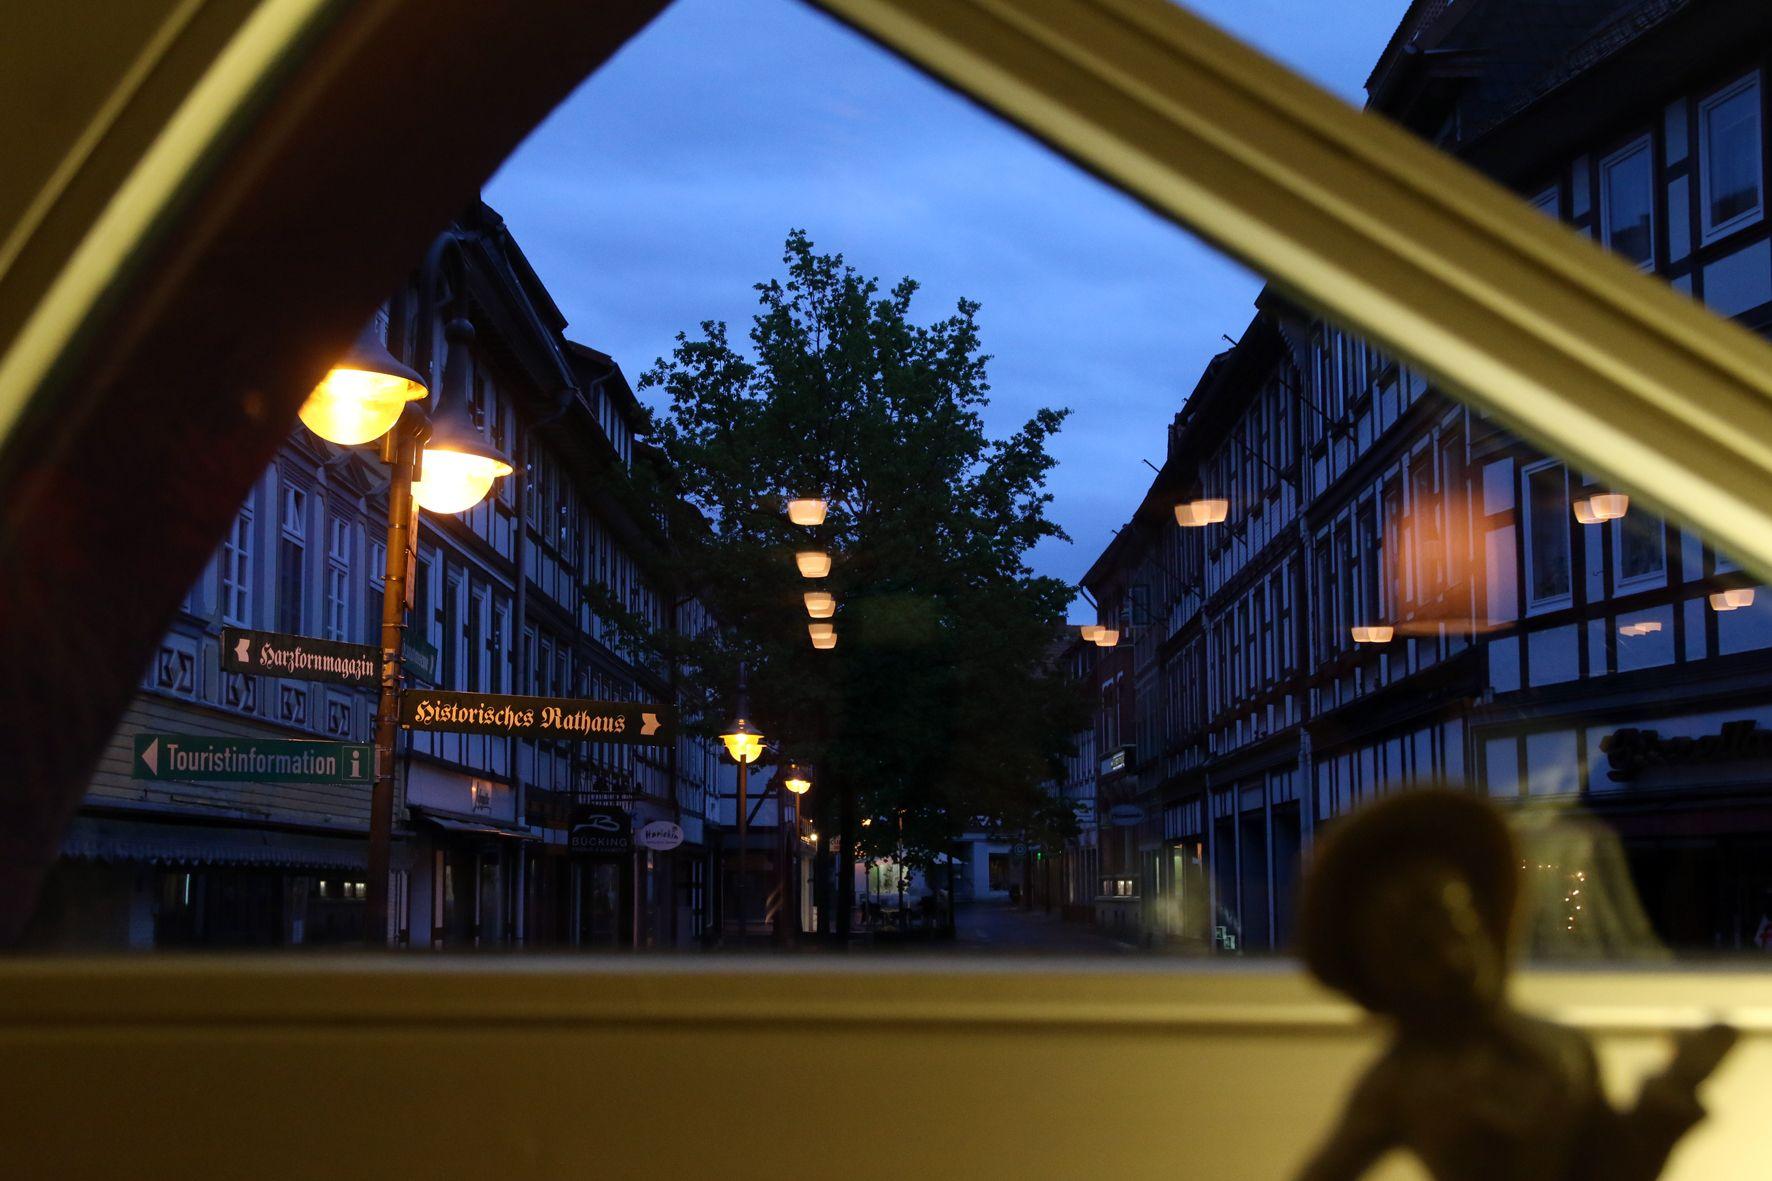 Blick aus dem Ratskeller in Osterode am Harz